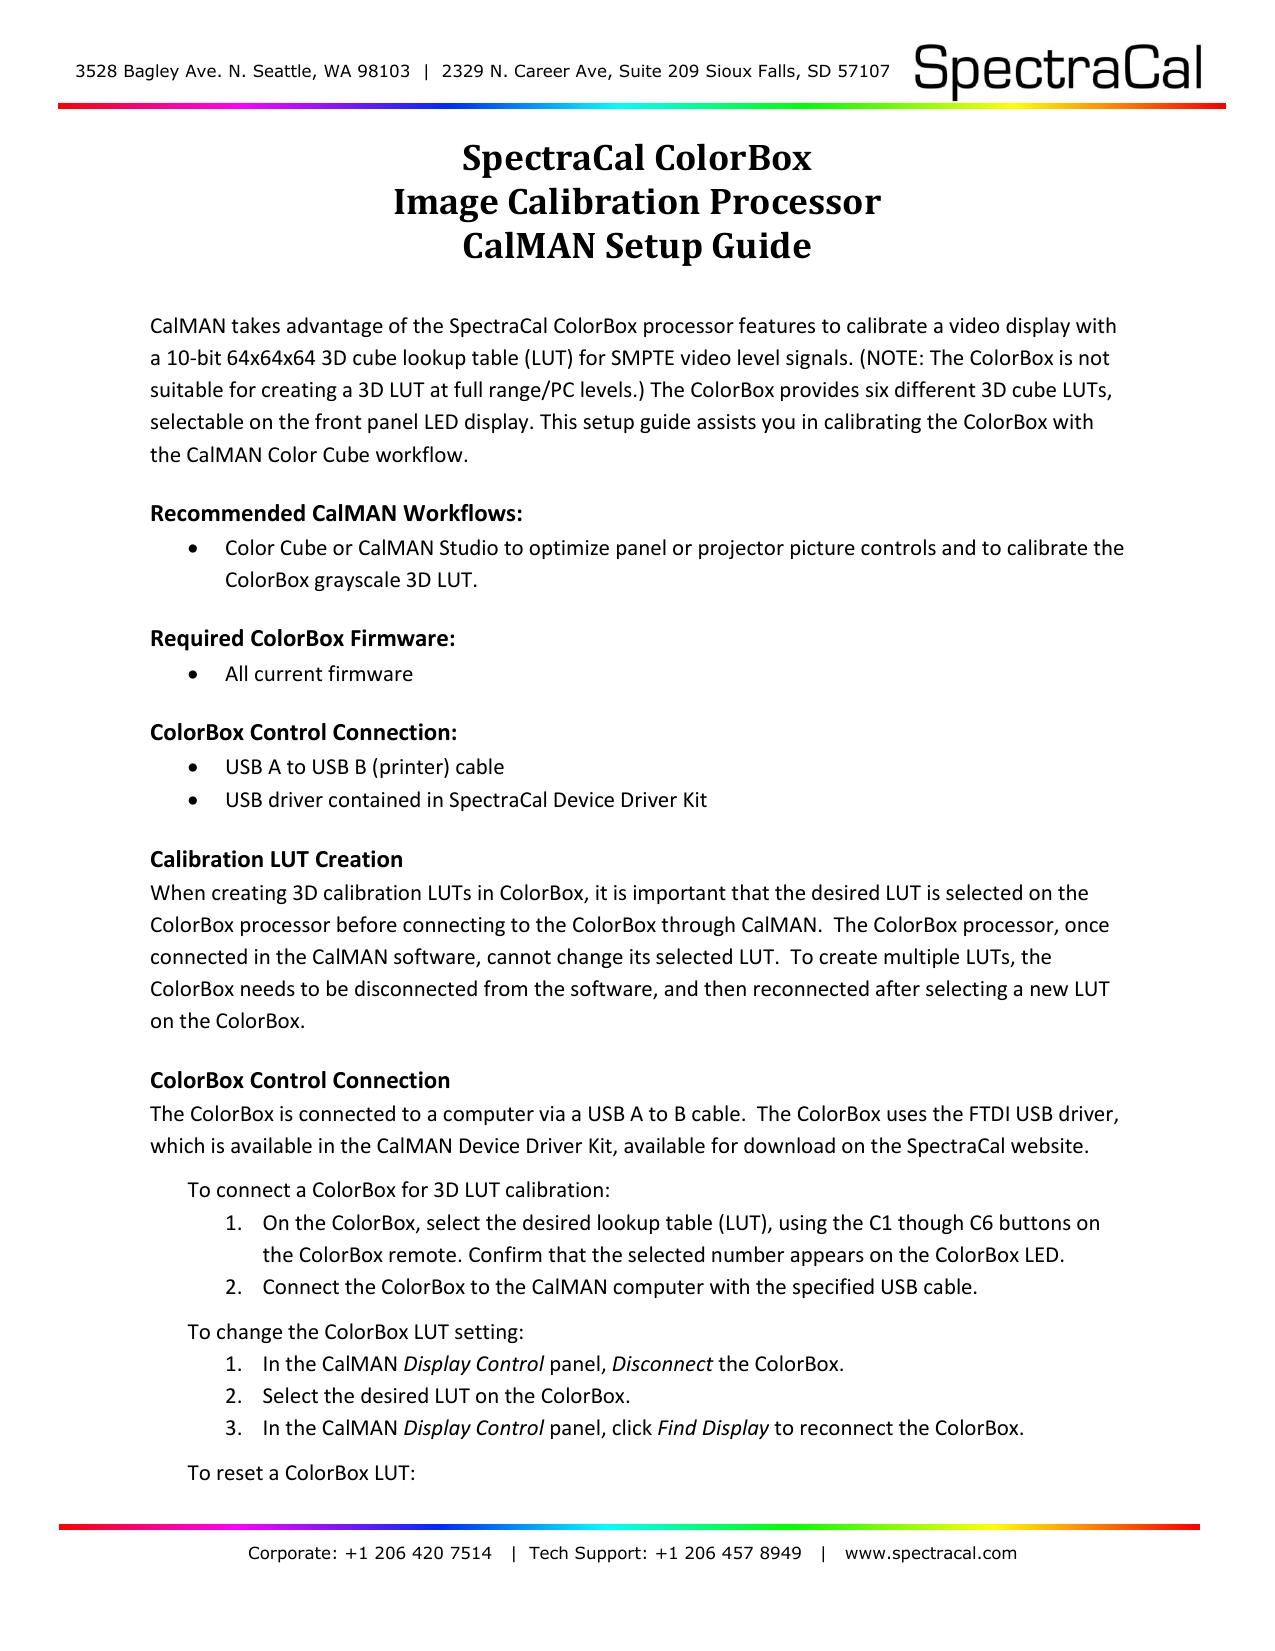 SpectraCal ColorBox Image Calibration Processor CalMAN Setup